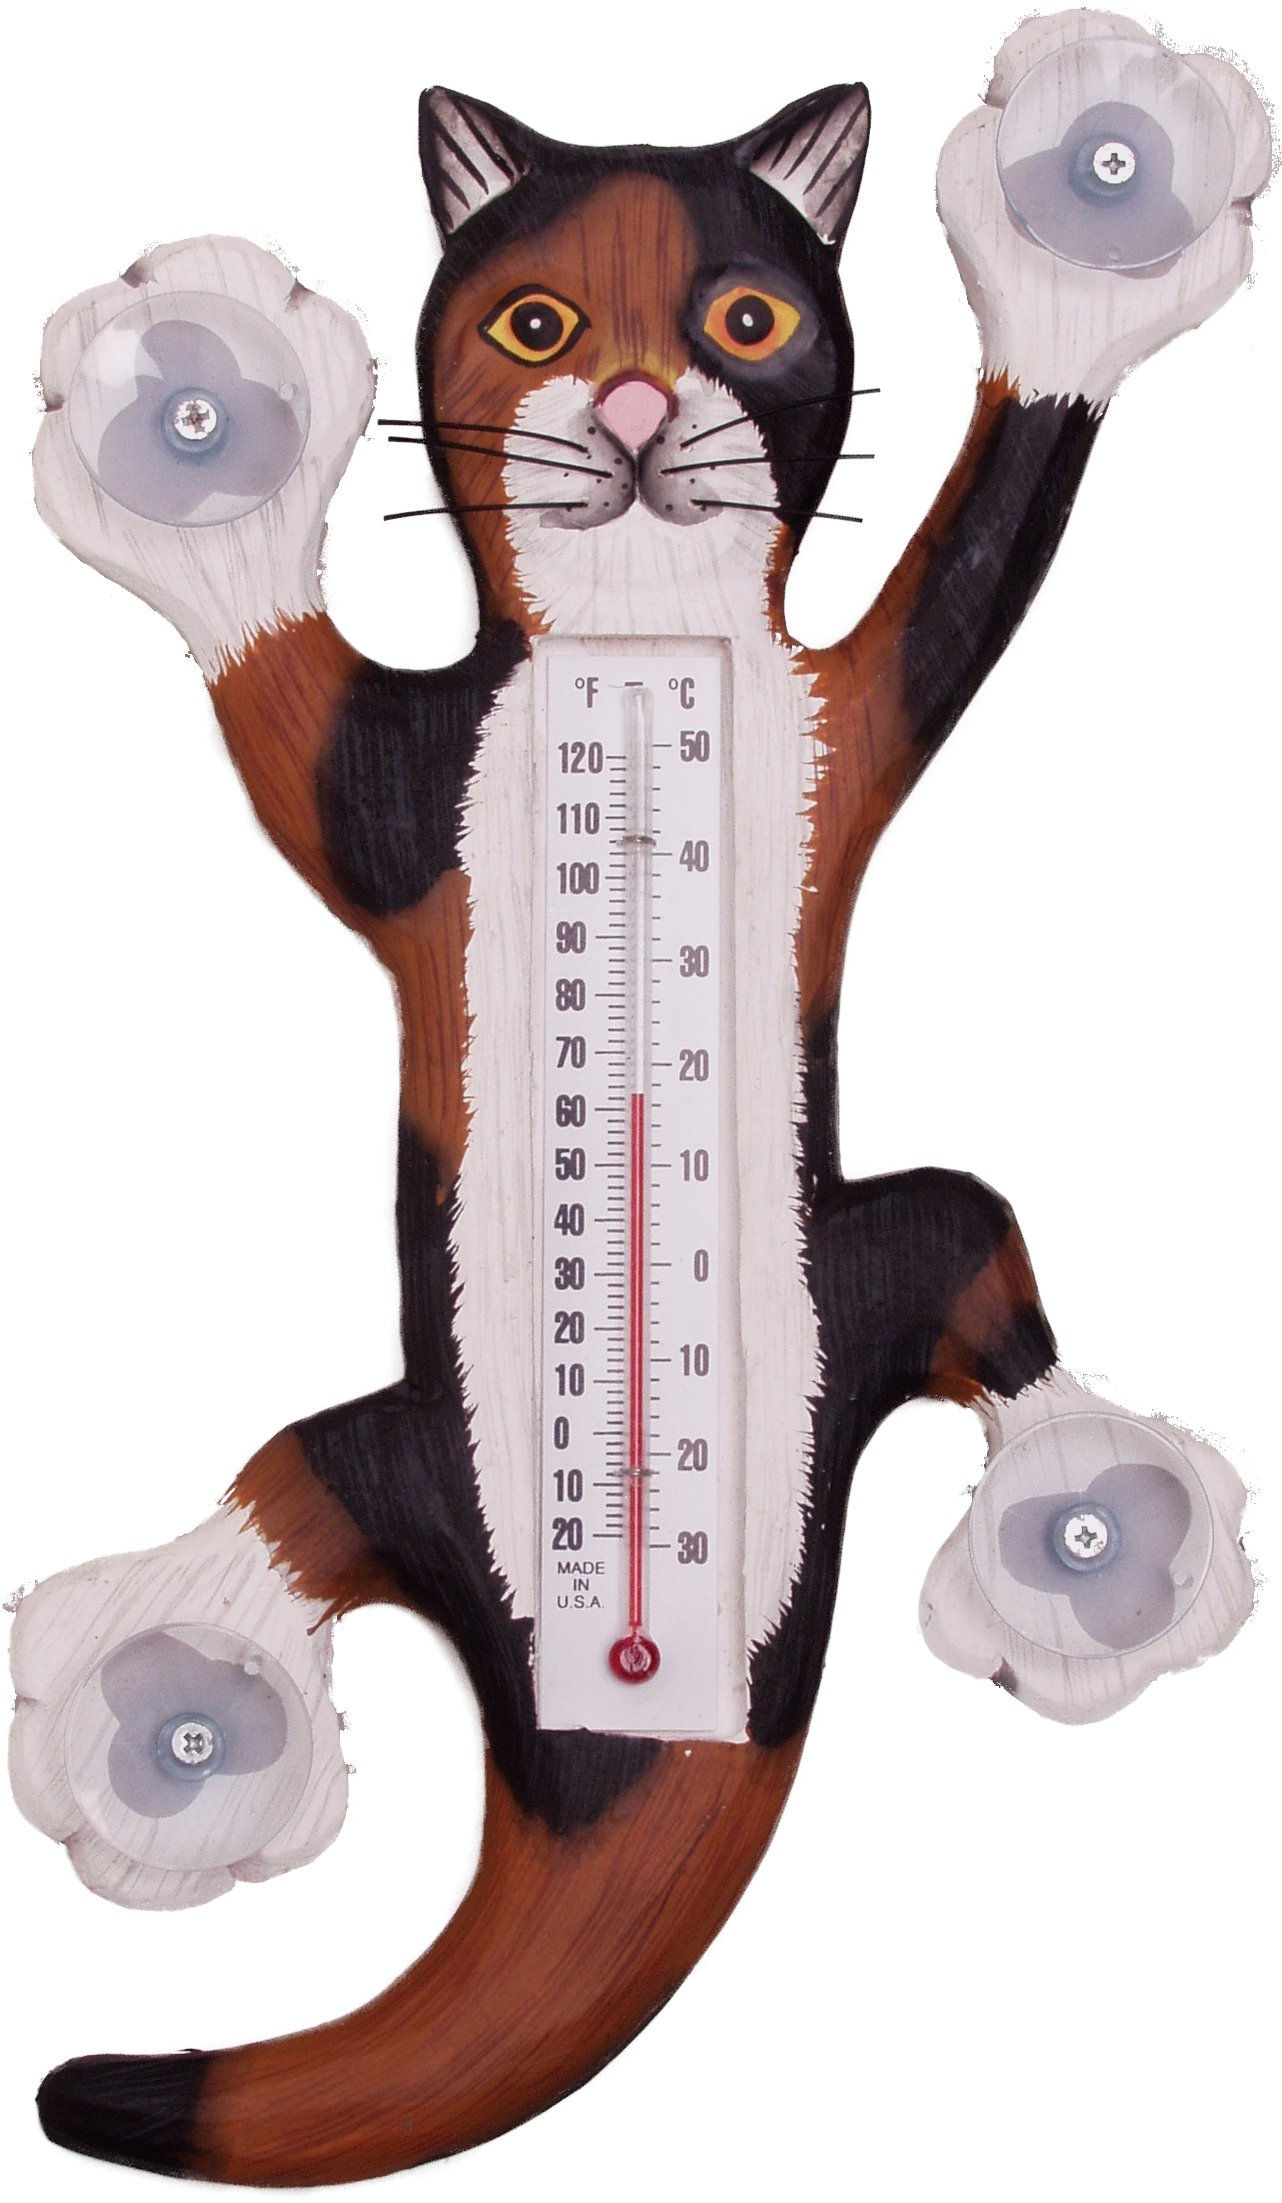 Songbird Essentials Climbing Calico Cat Large Window Thermometer